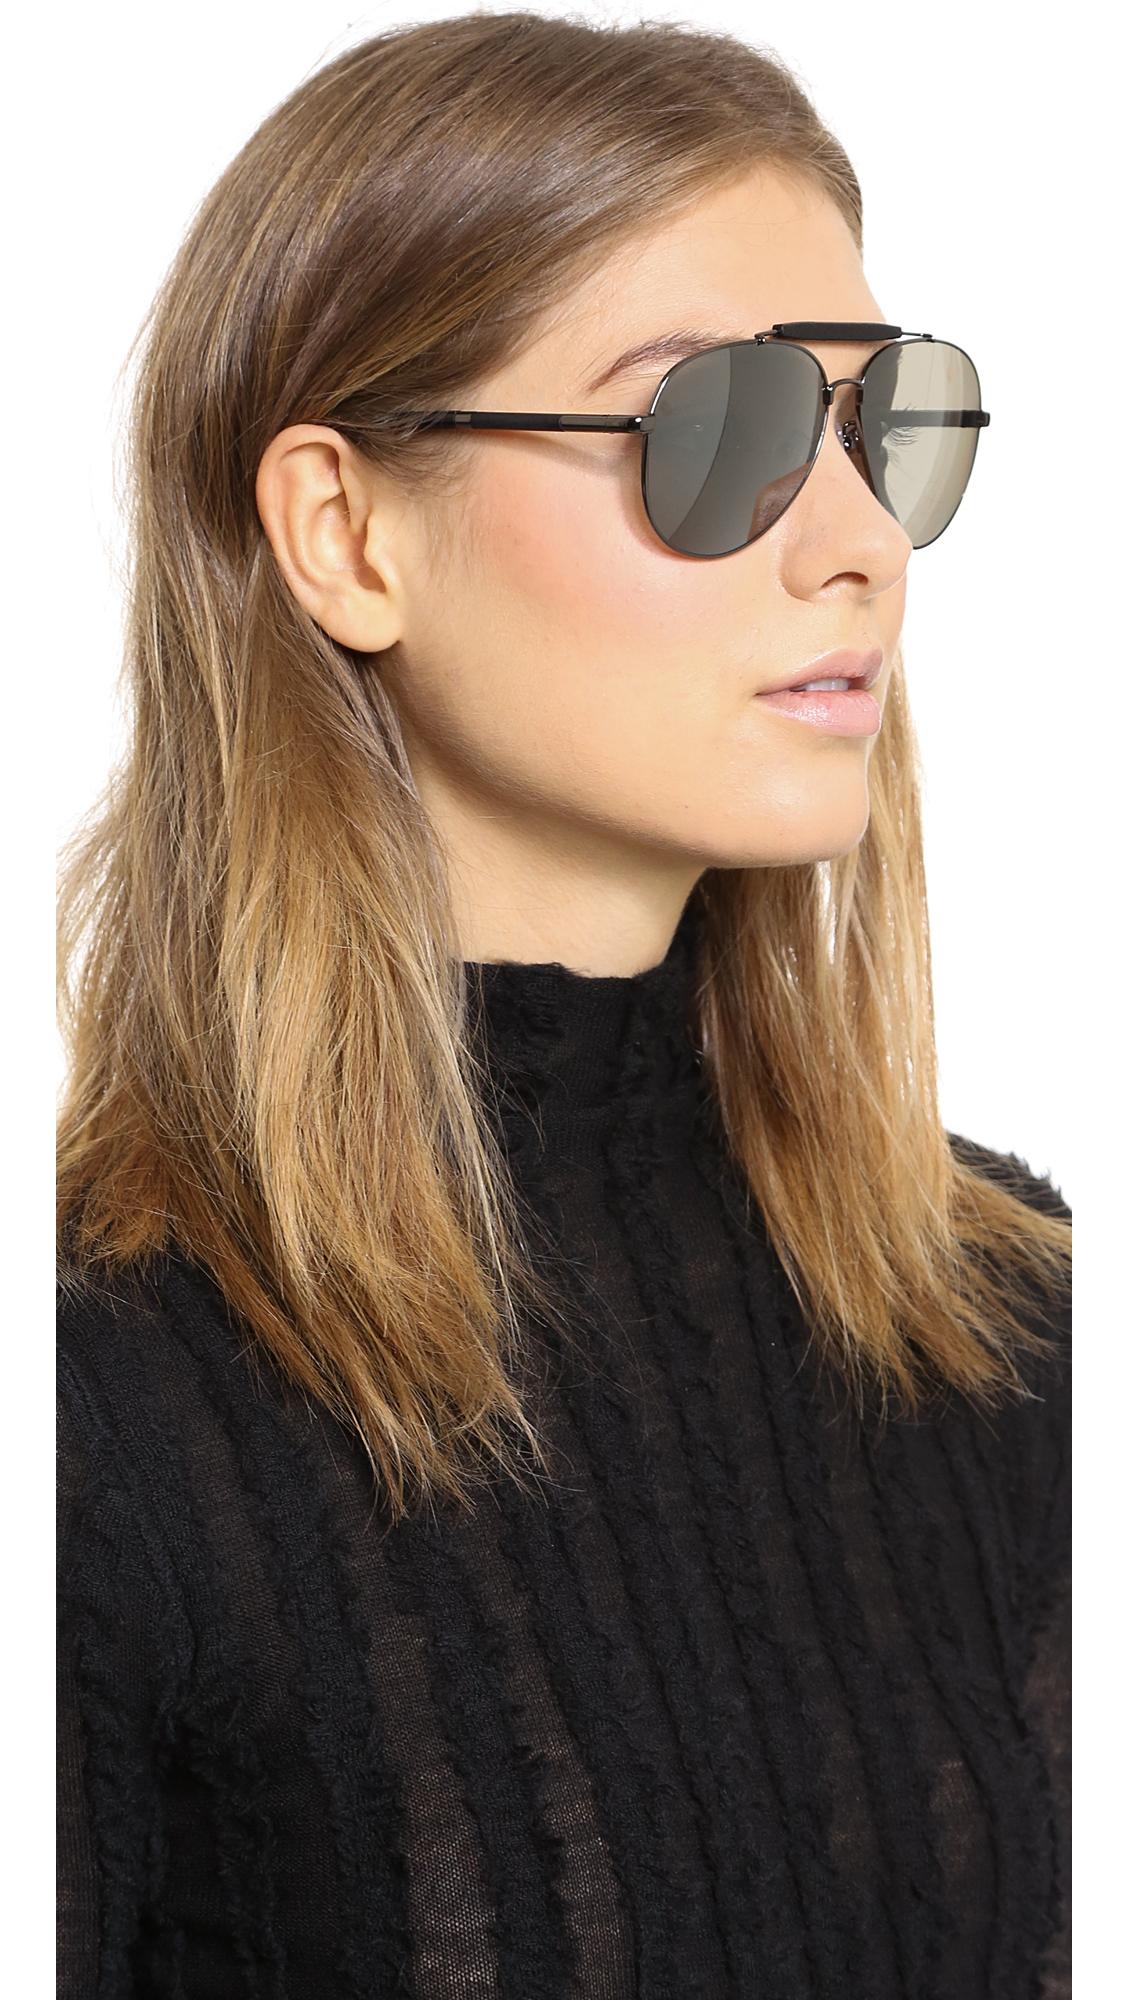 ae53011ffb8 Lyst - Givenchy Top Bar Aviator Sunglasses - Gunmetal Smoke Mirror ...